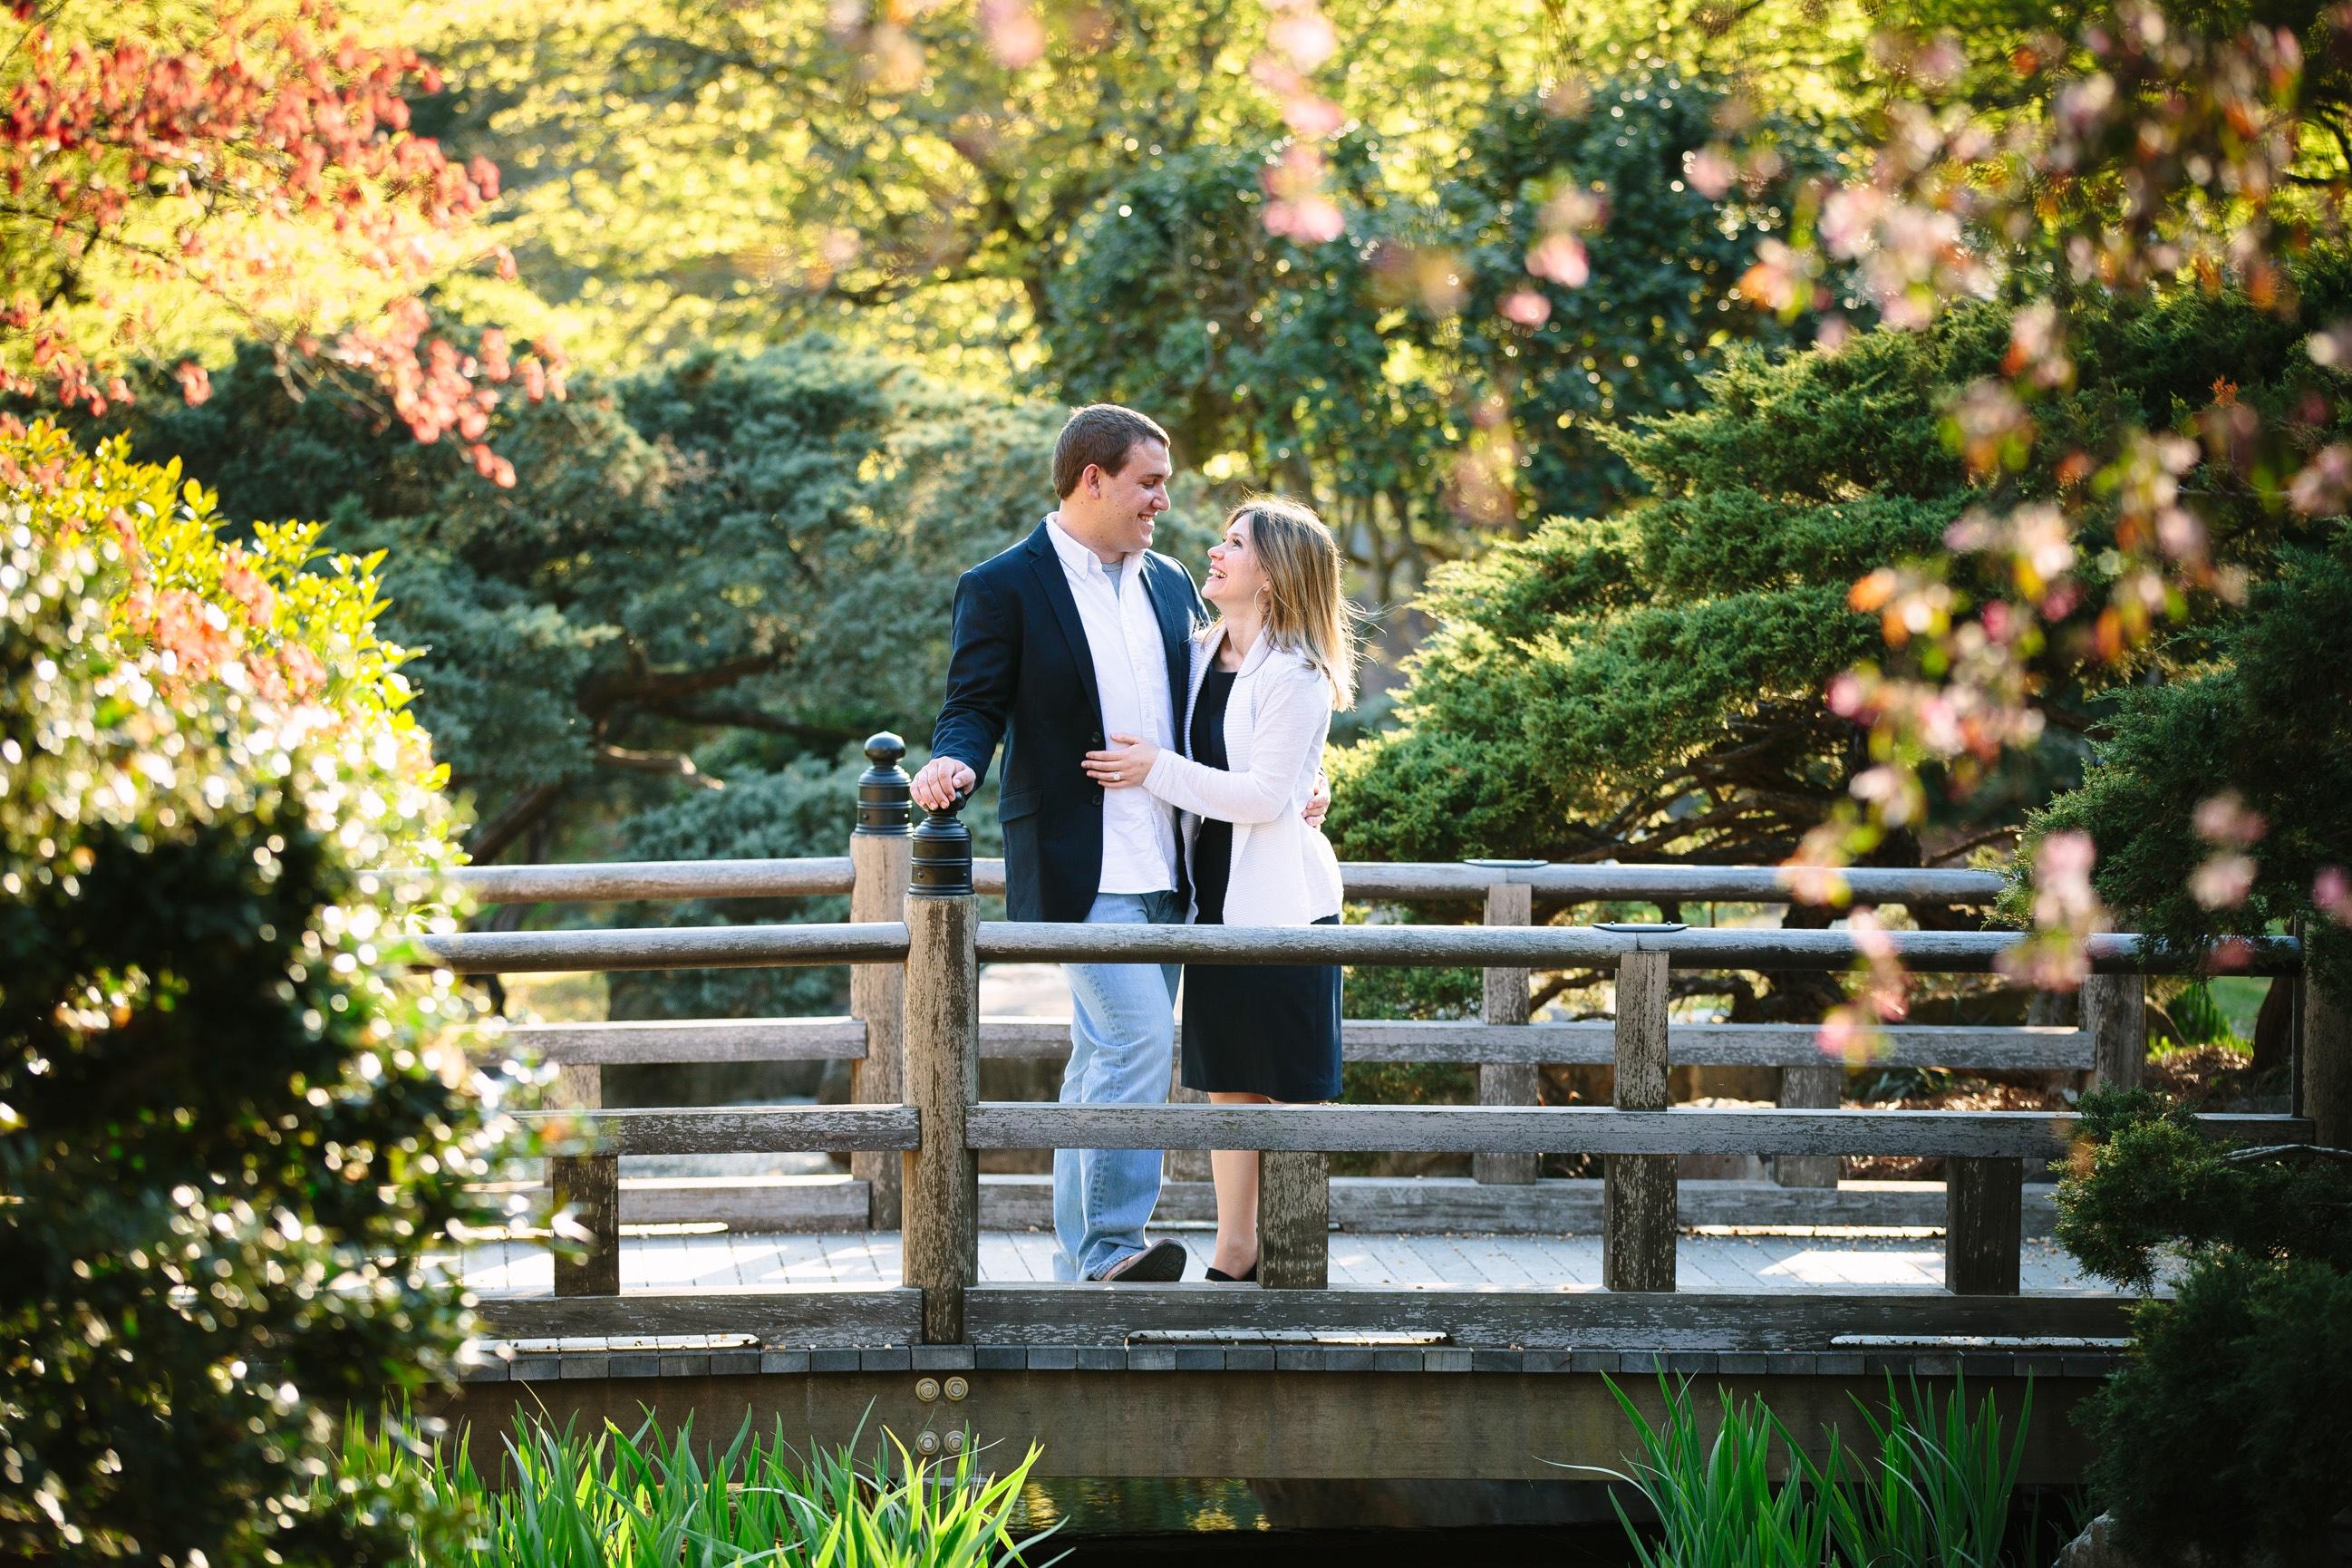 Tags: Birmingham Botanical Gardens, Engagements